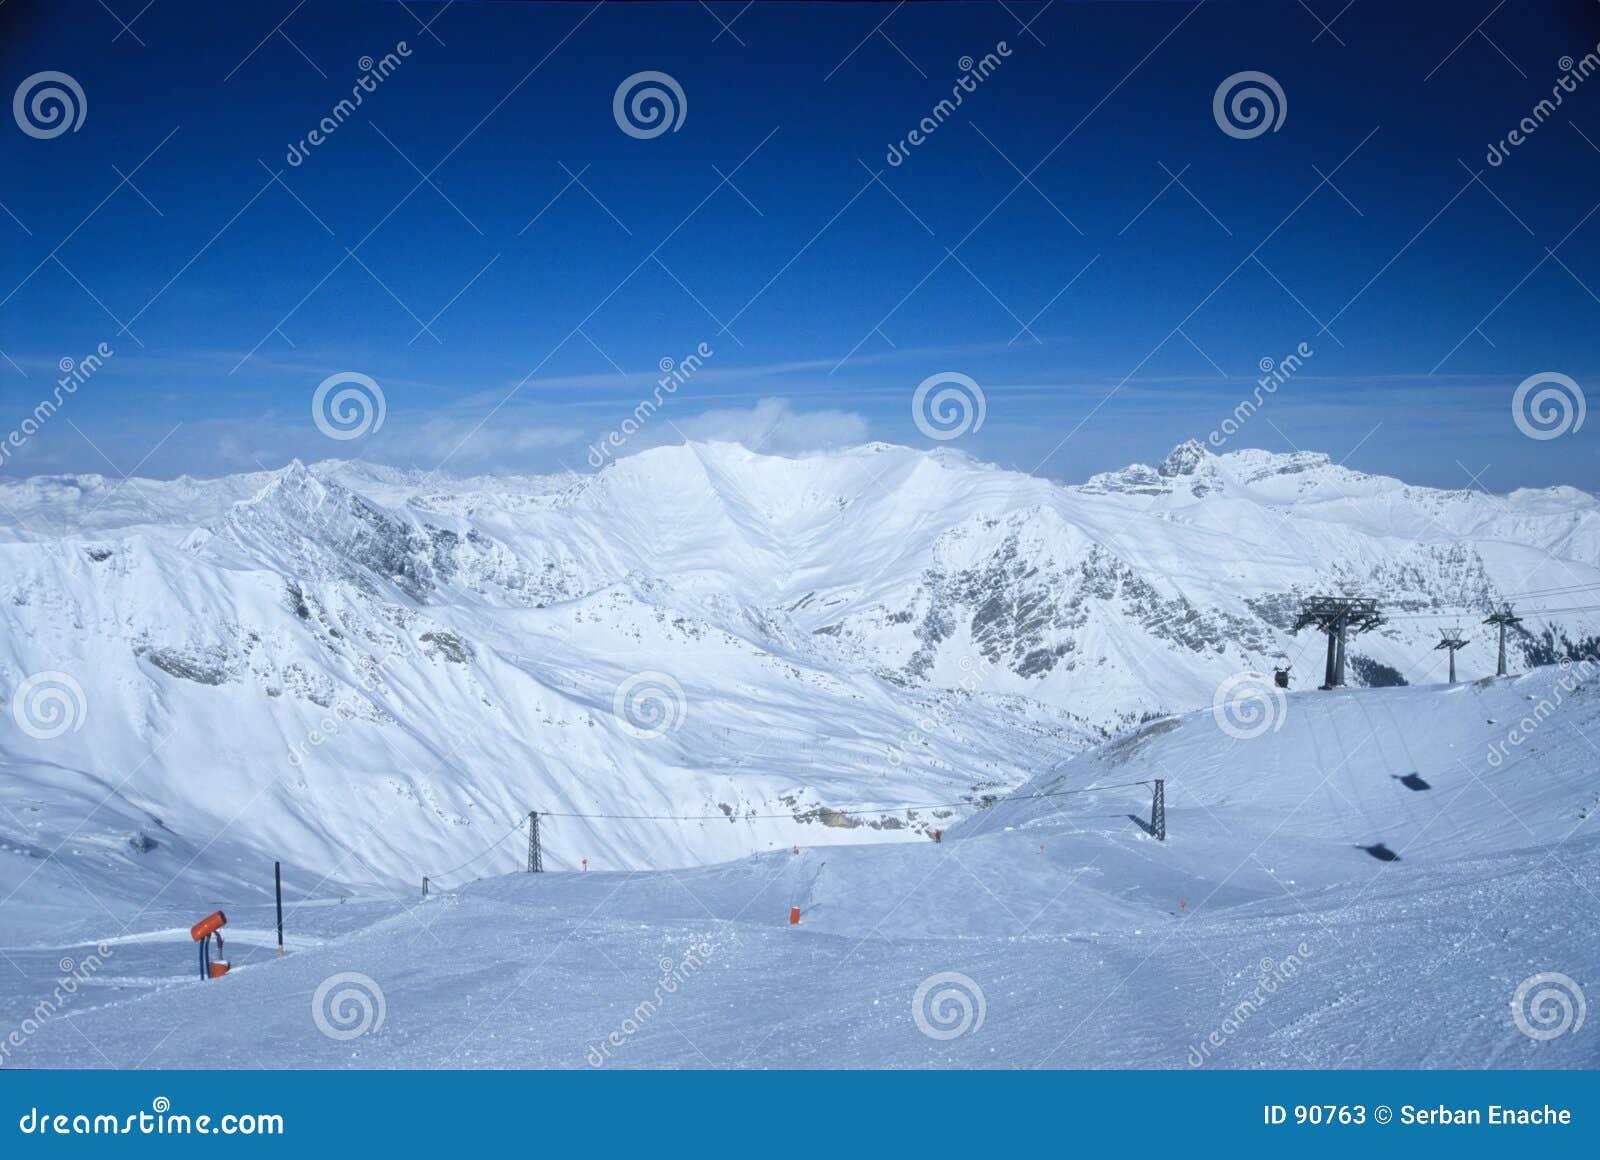 7 austriackich alp